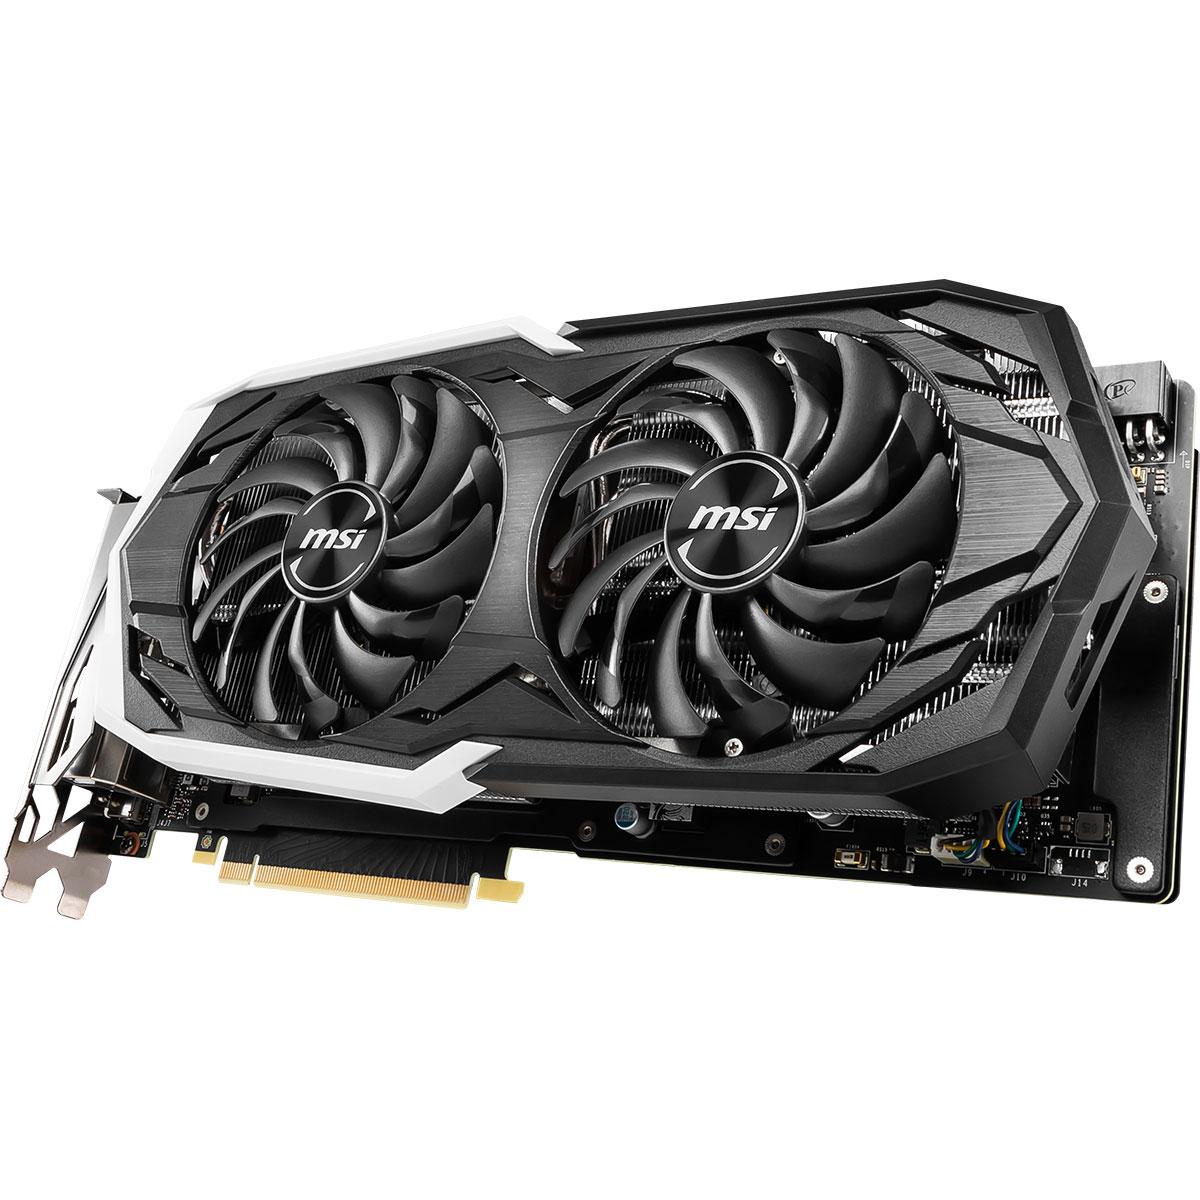 GeForce RTX 2070 ARMOR 8G OC (912-V373-226 --) - Achat / Vente Carte graphique sur Picata.fr - 3